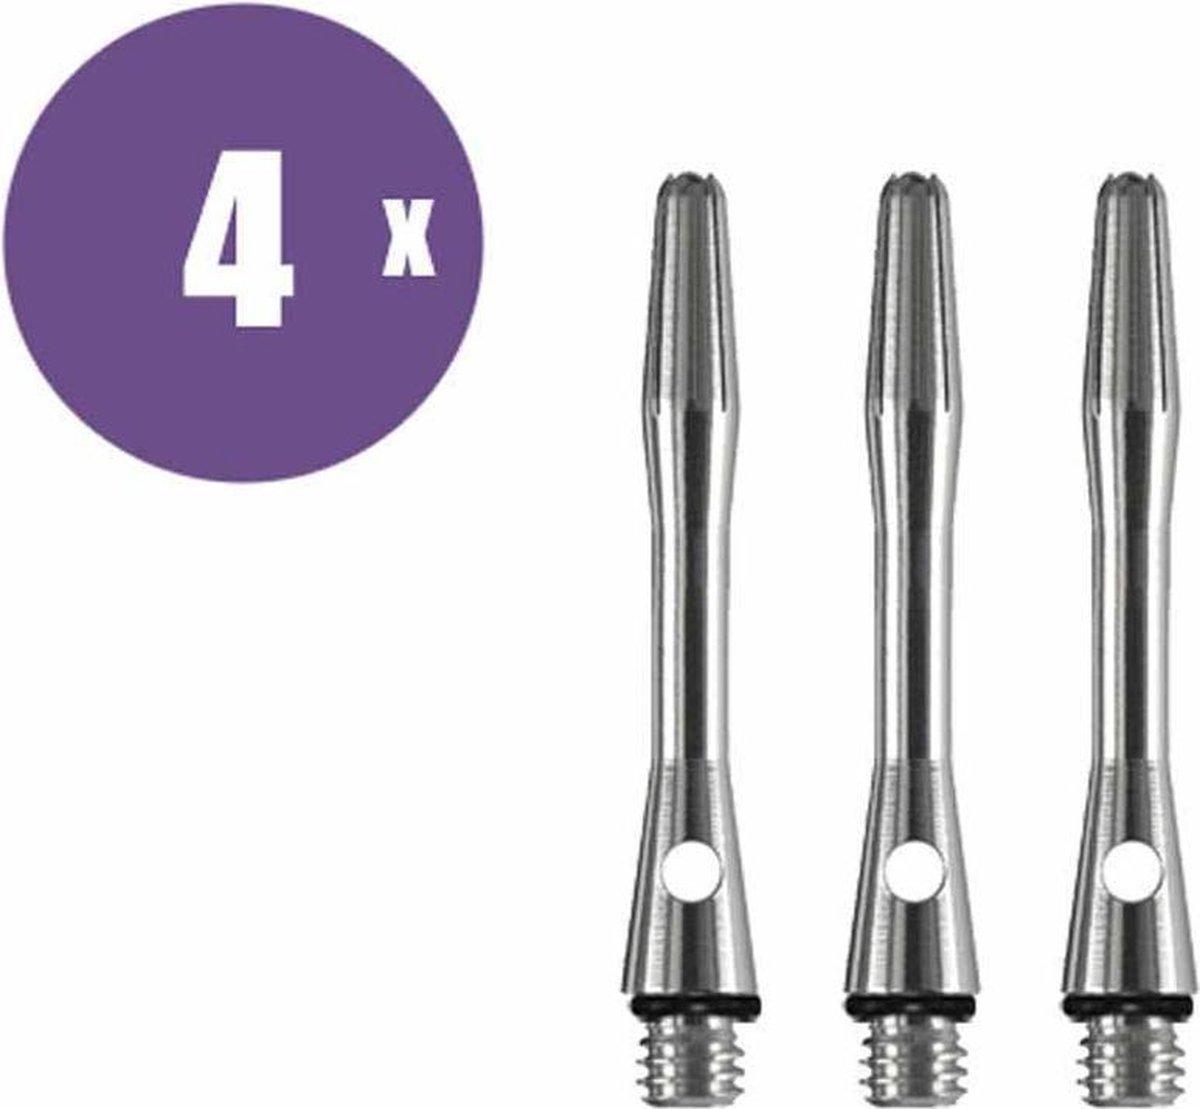 ABC Darts Shafts - Aluminium Naturel - Extra Short - 4 sets dartshafts